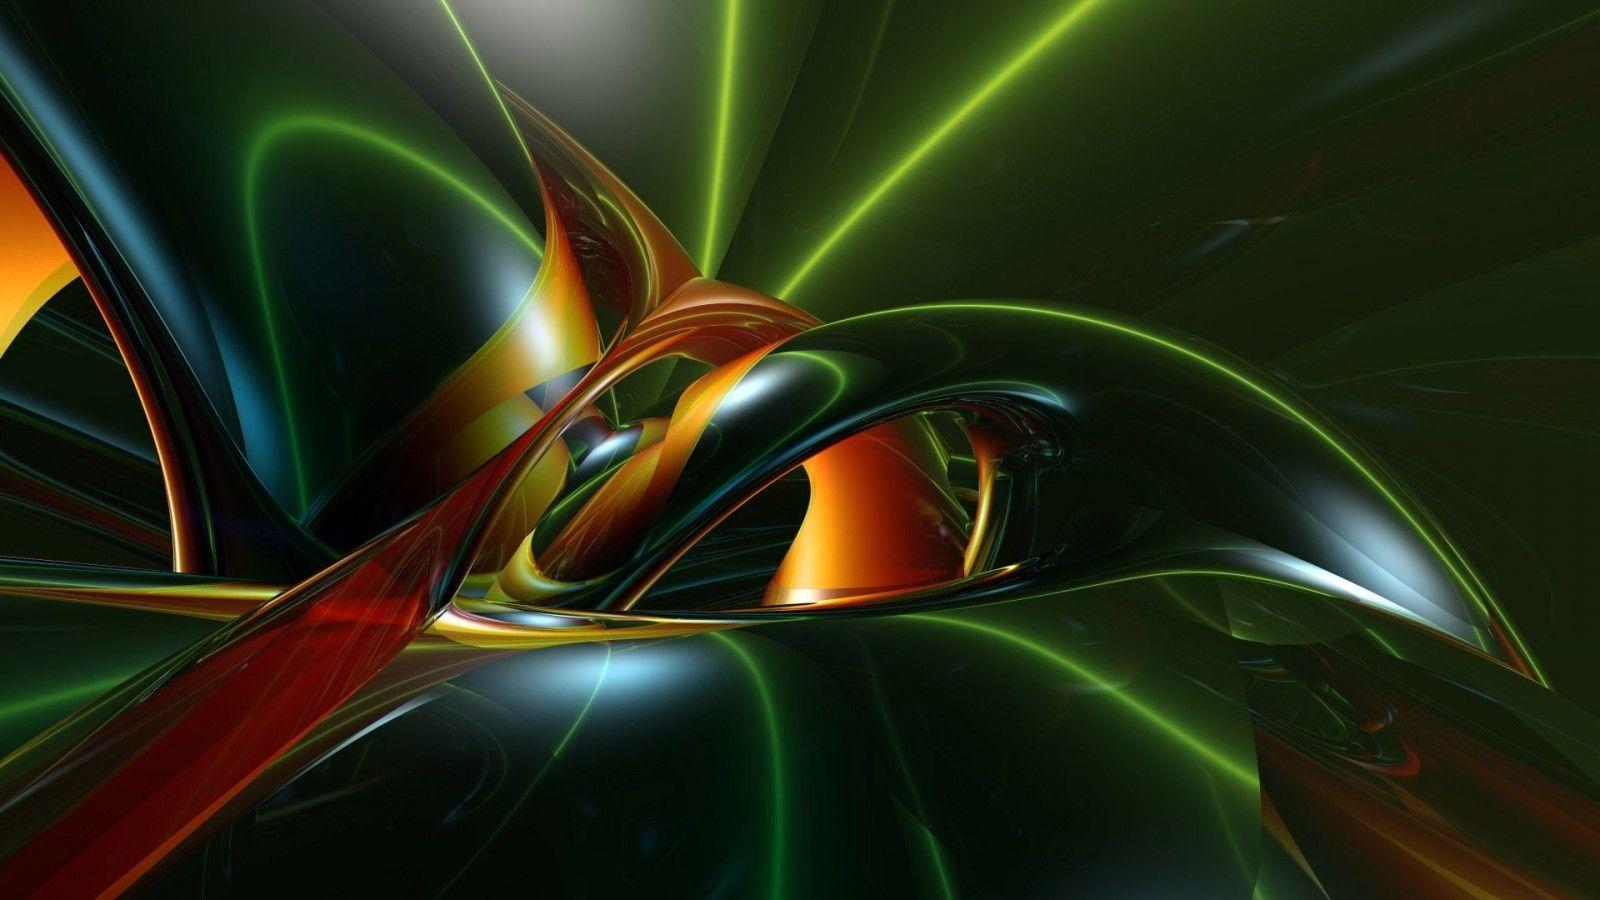 Wallpaper Abstract 3d